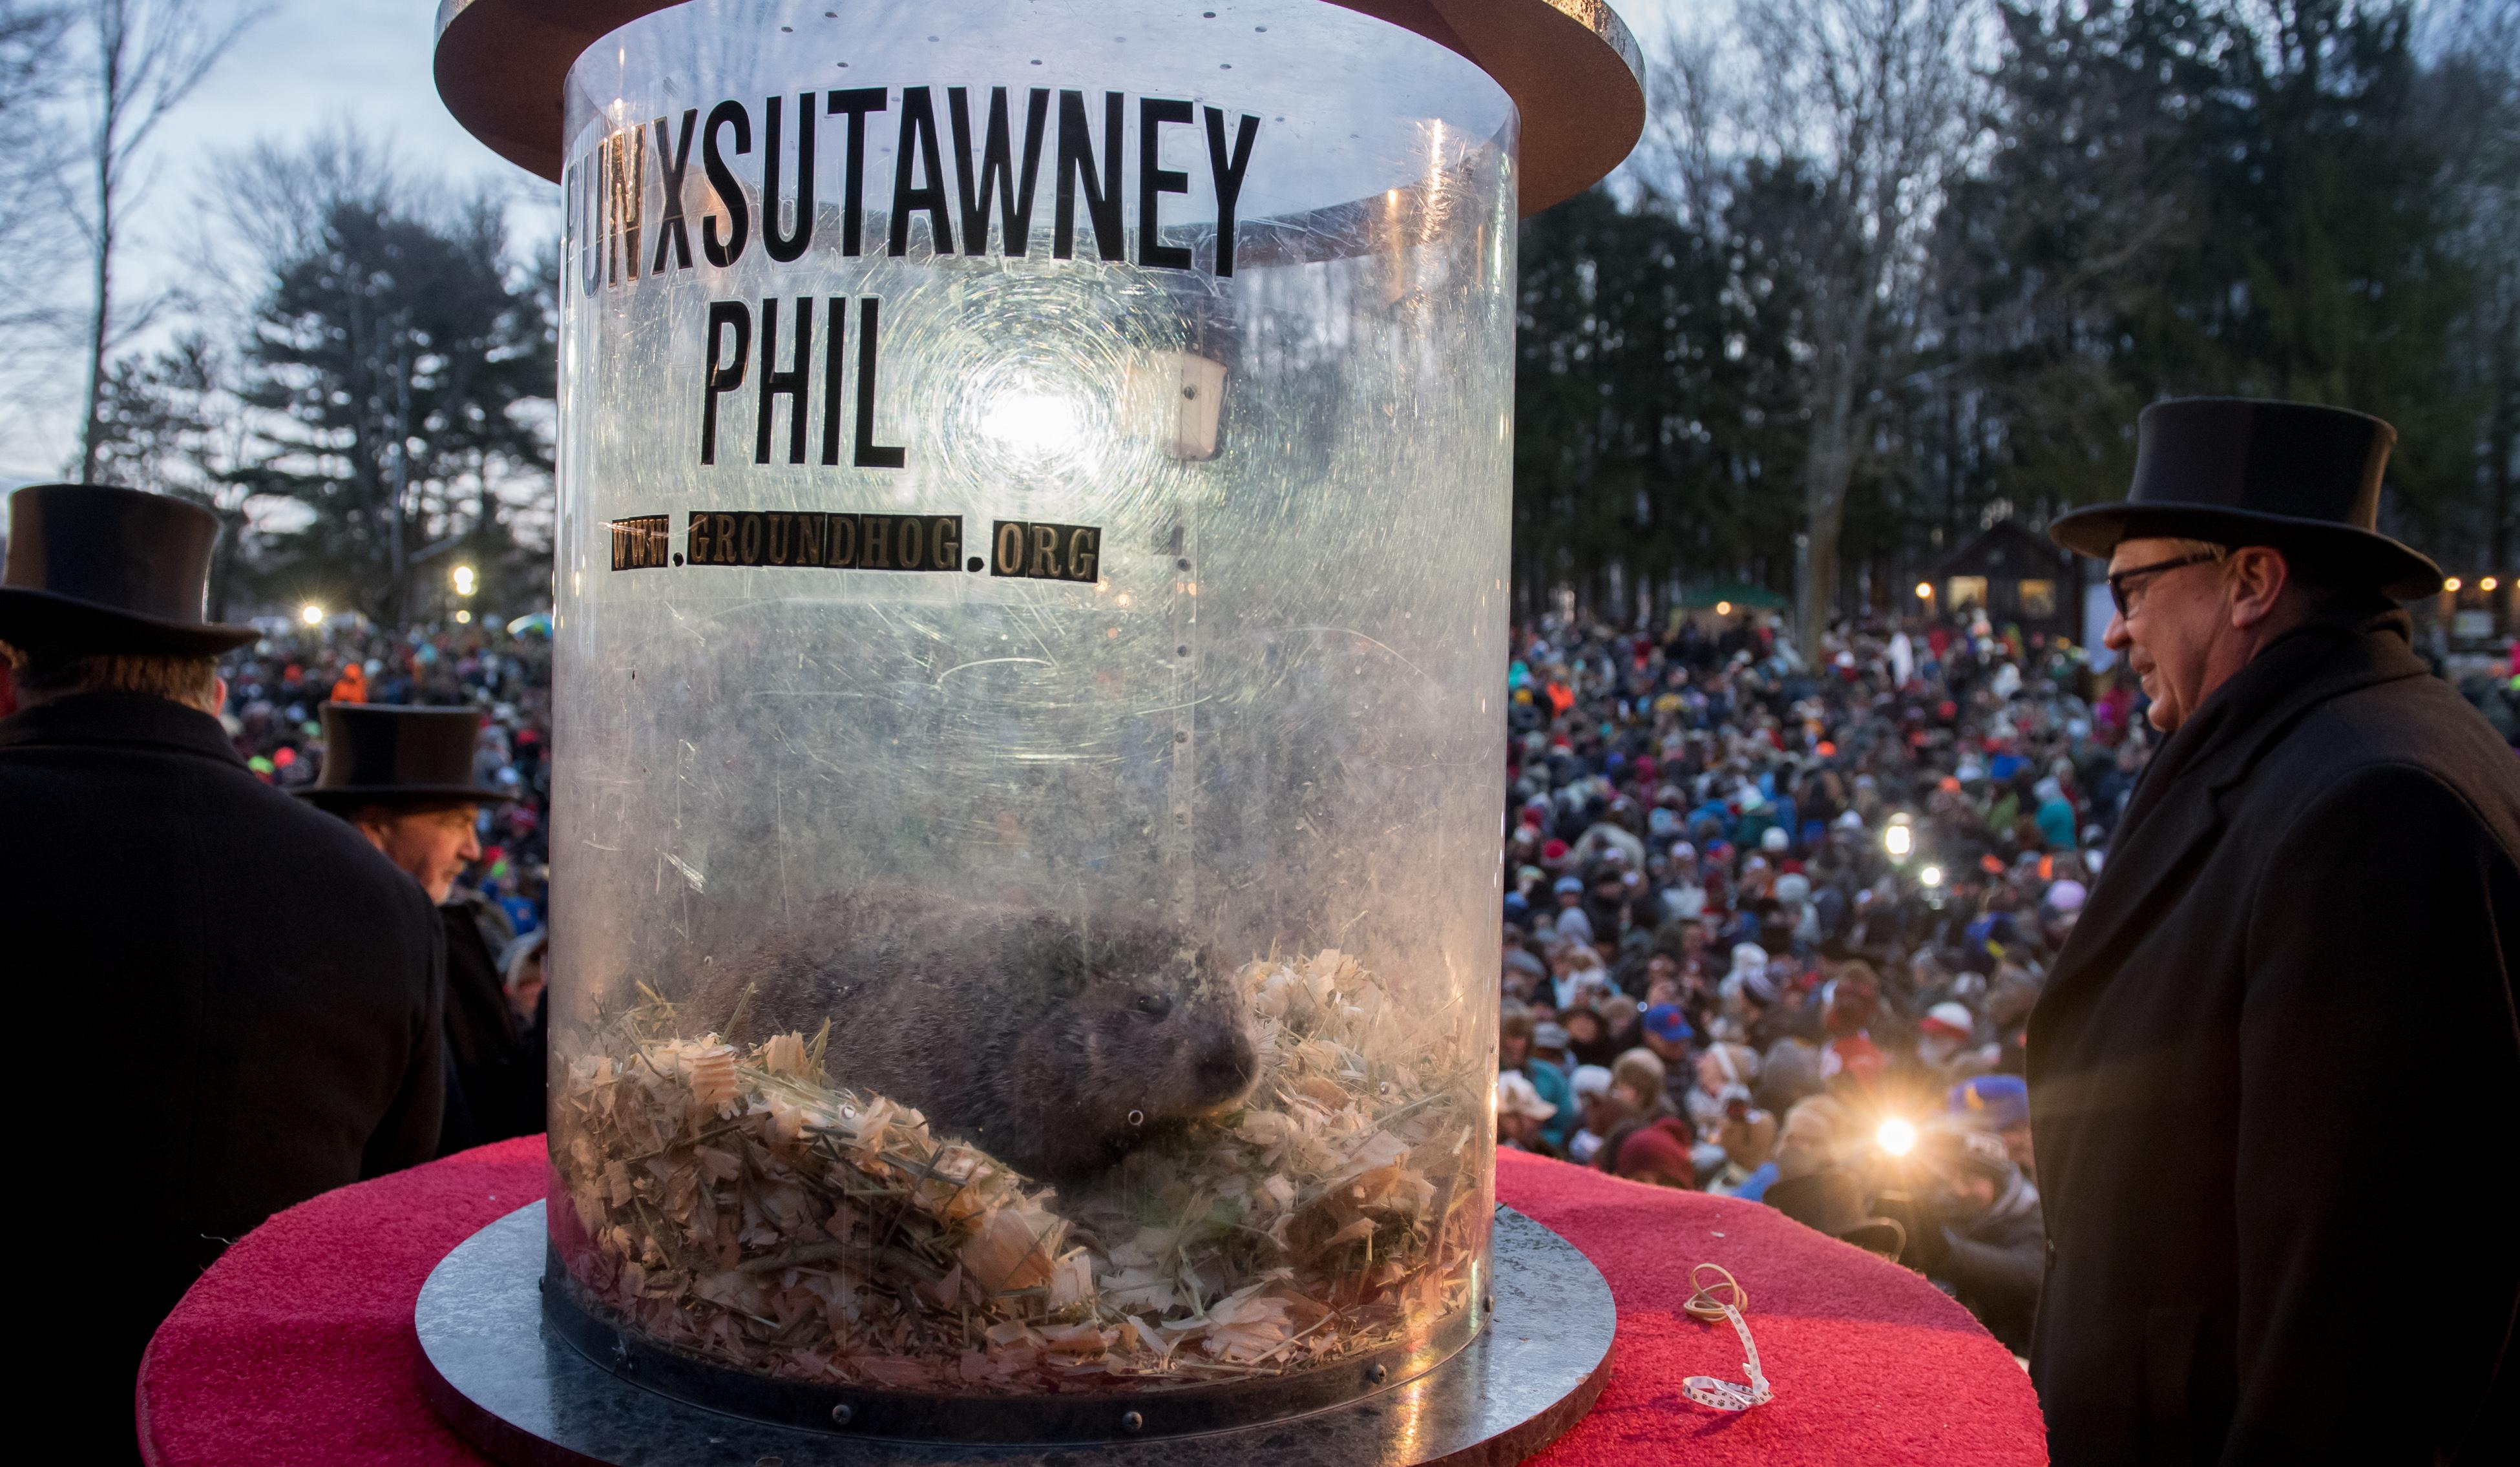 Say It Ain't So: Punxsutawney Phil Predicts 6 More Weeks